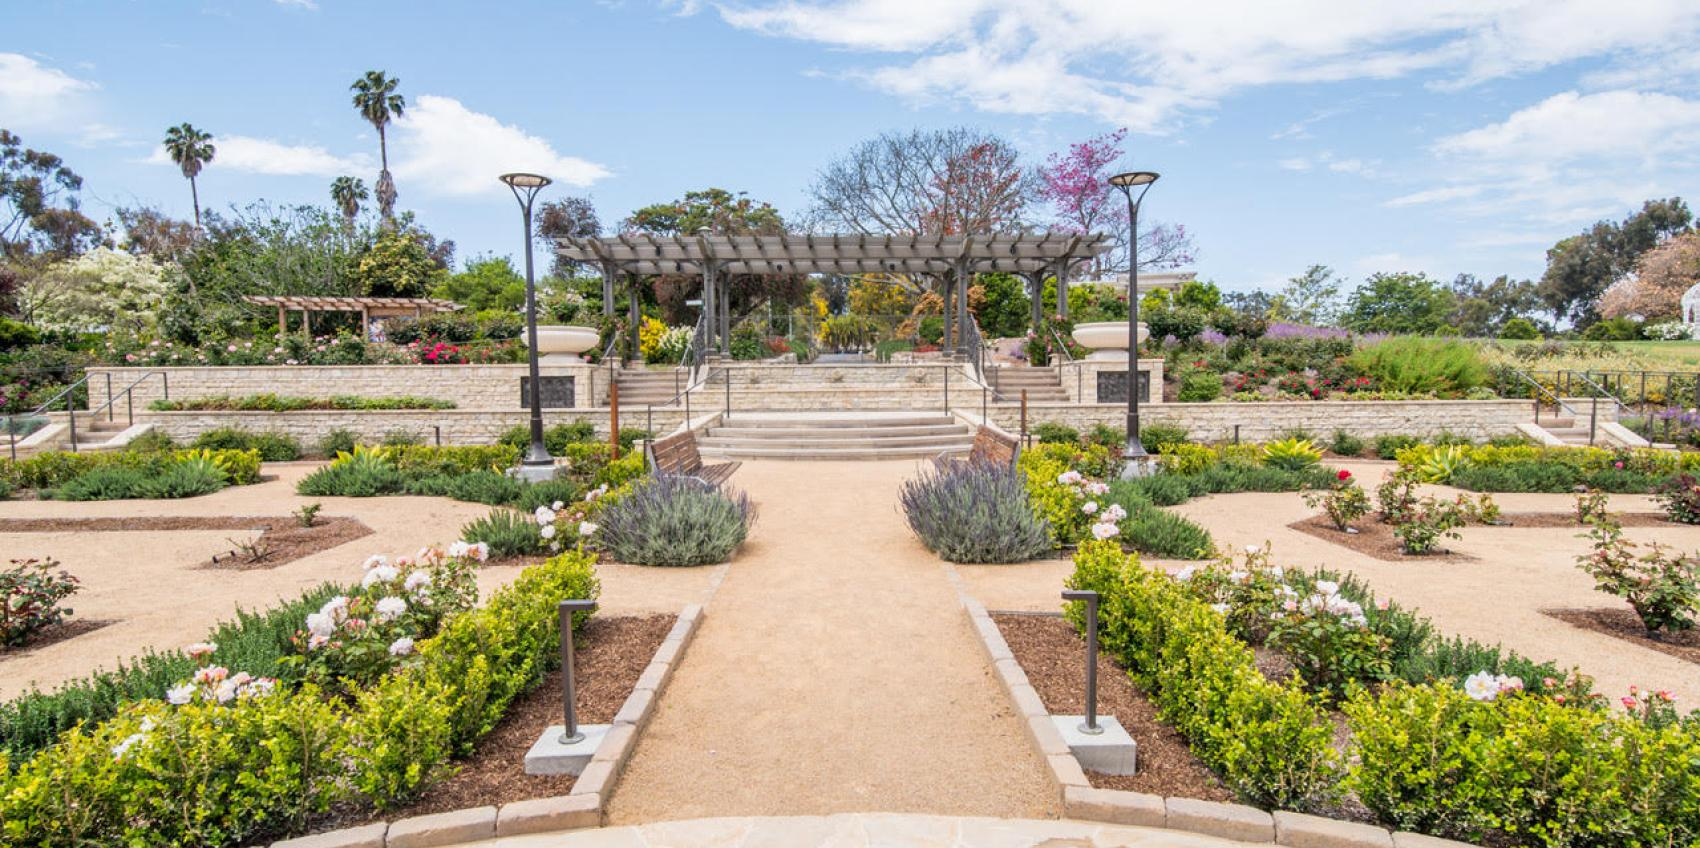 South Coast Botanic Garden American Public Gardens Association